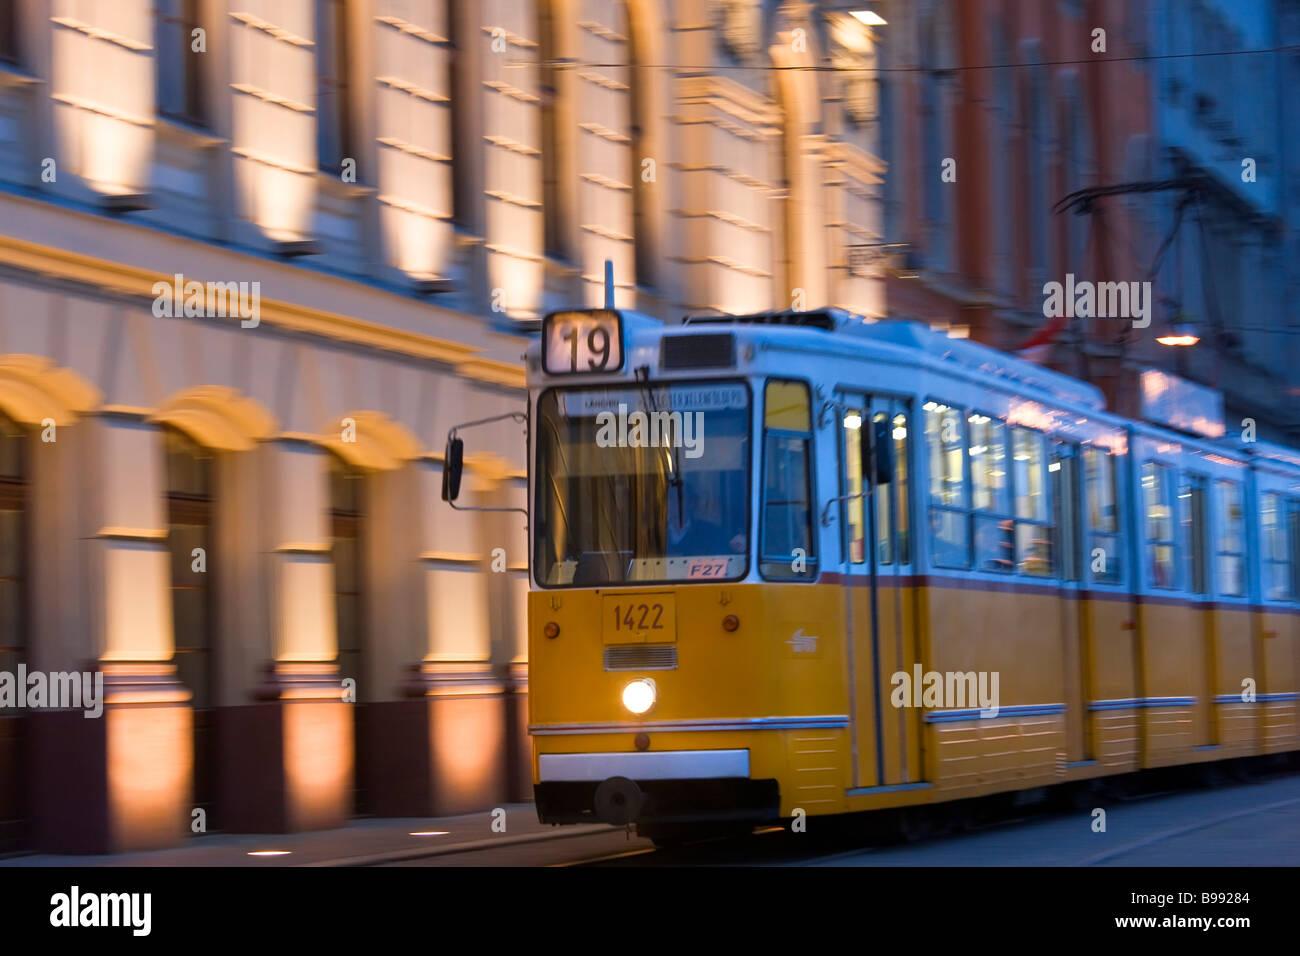 Tram Budapest Hungary - Stock Image